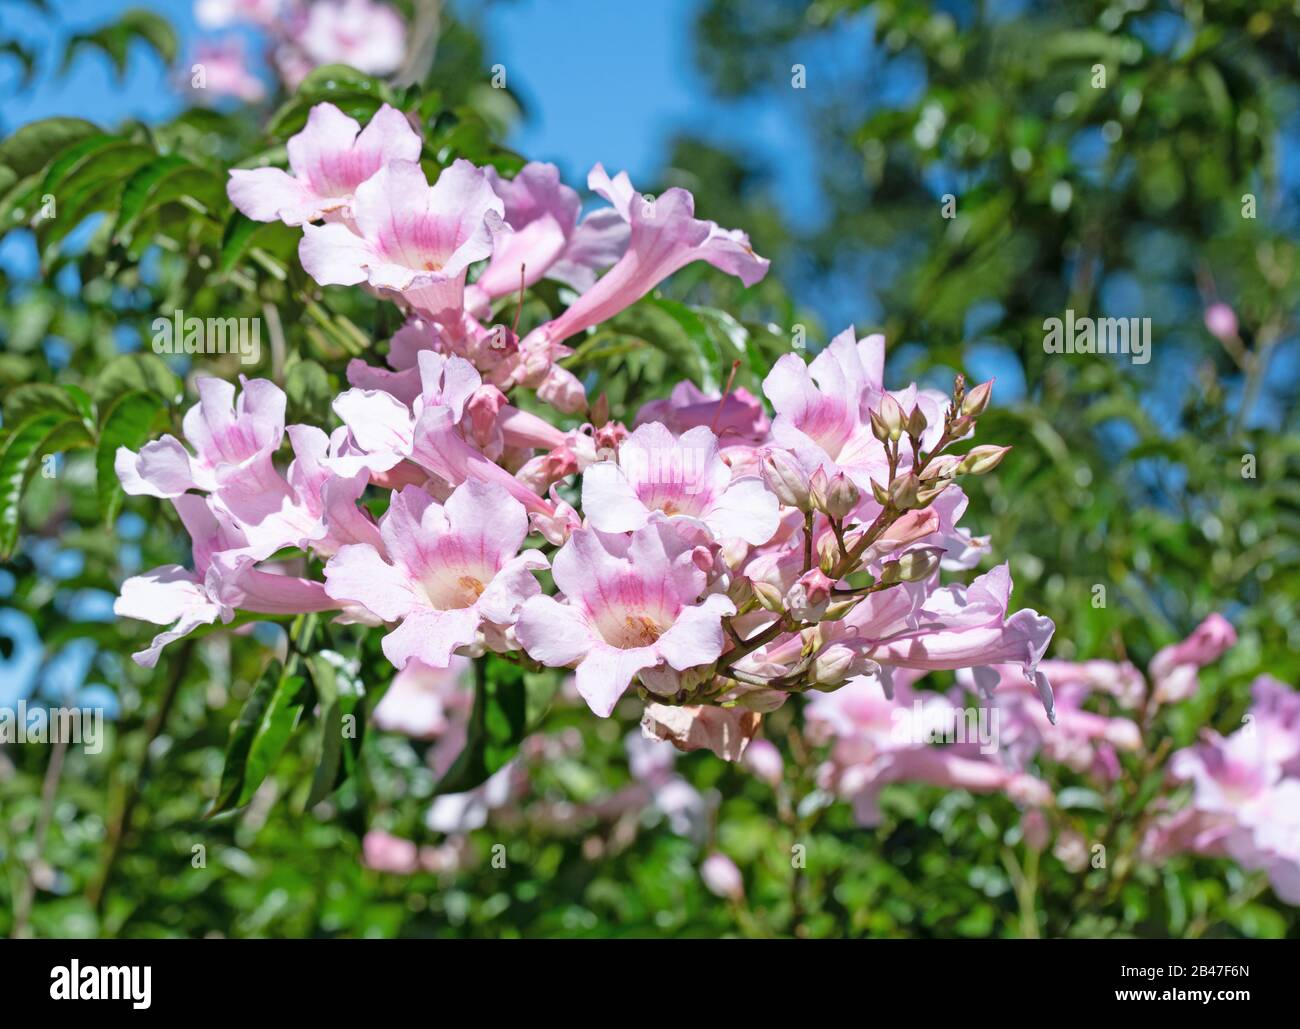 Flowering trumpet wine, Podranea, in summer Stock Photo